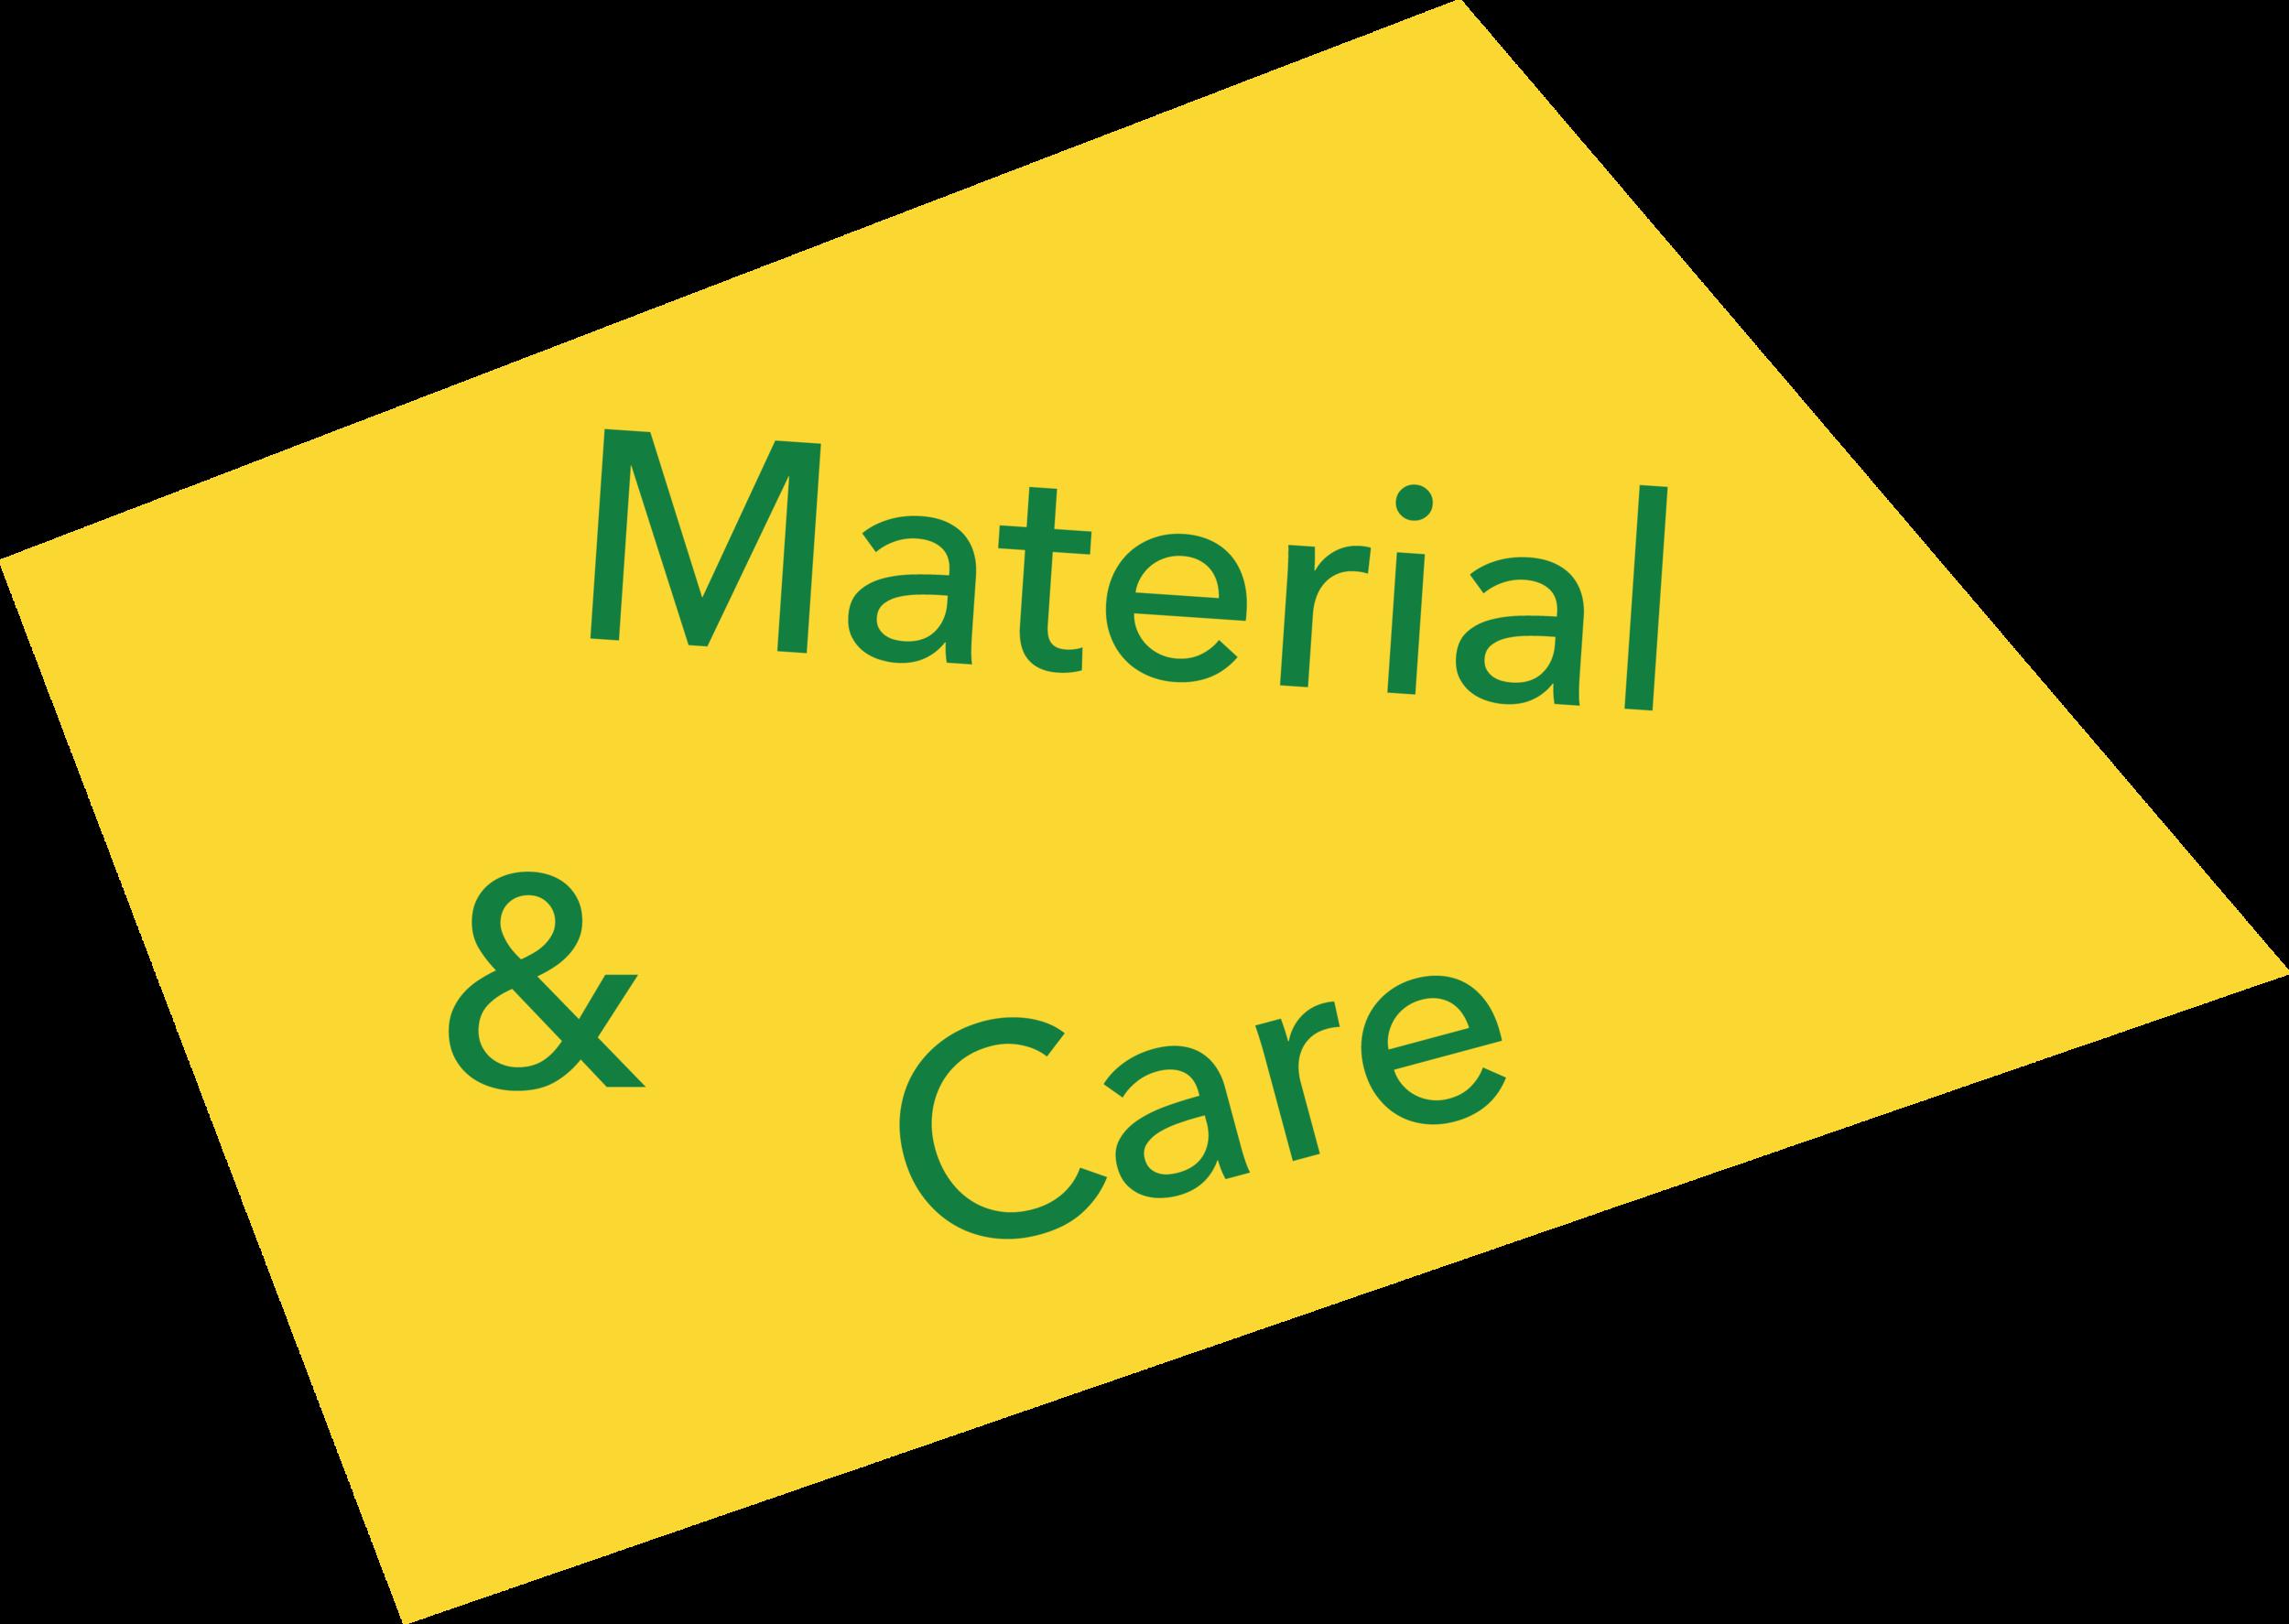 Material & Care